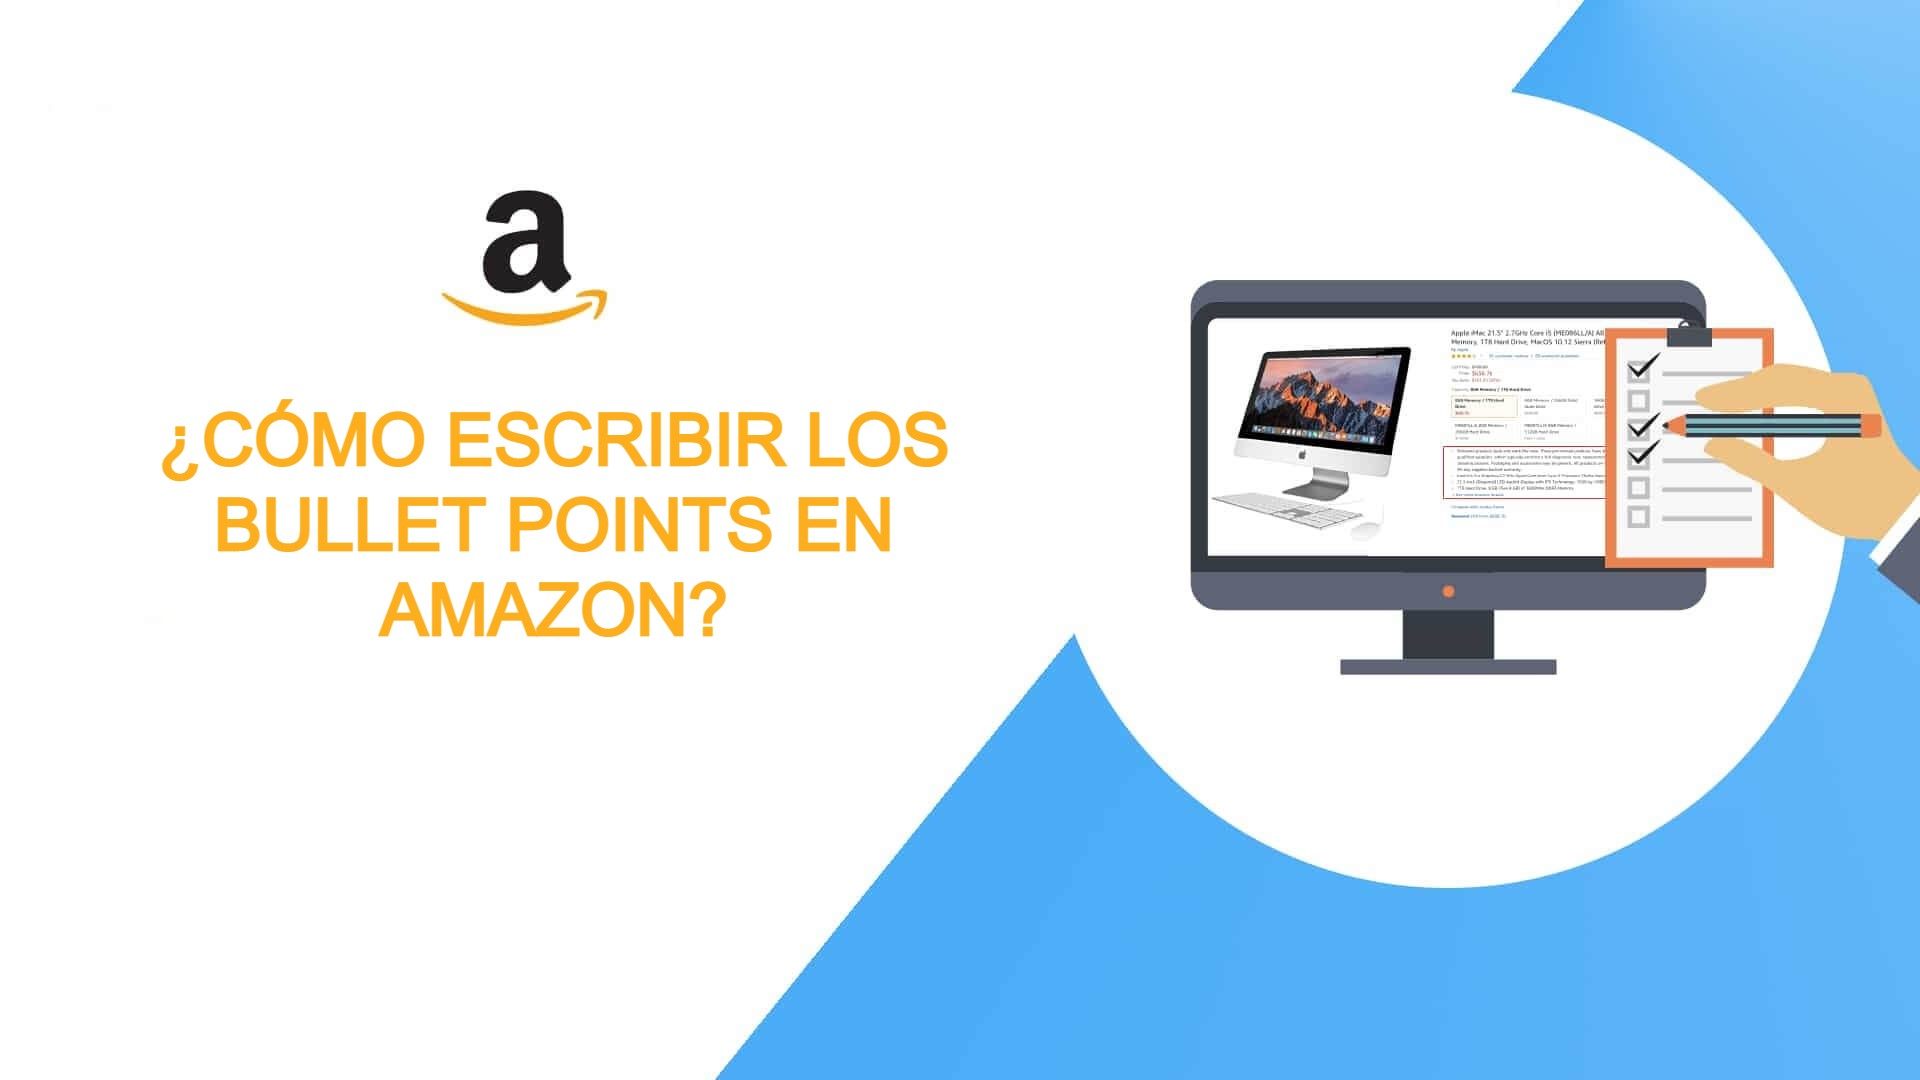 bullet points en Amazon